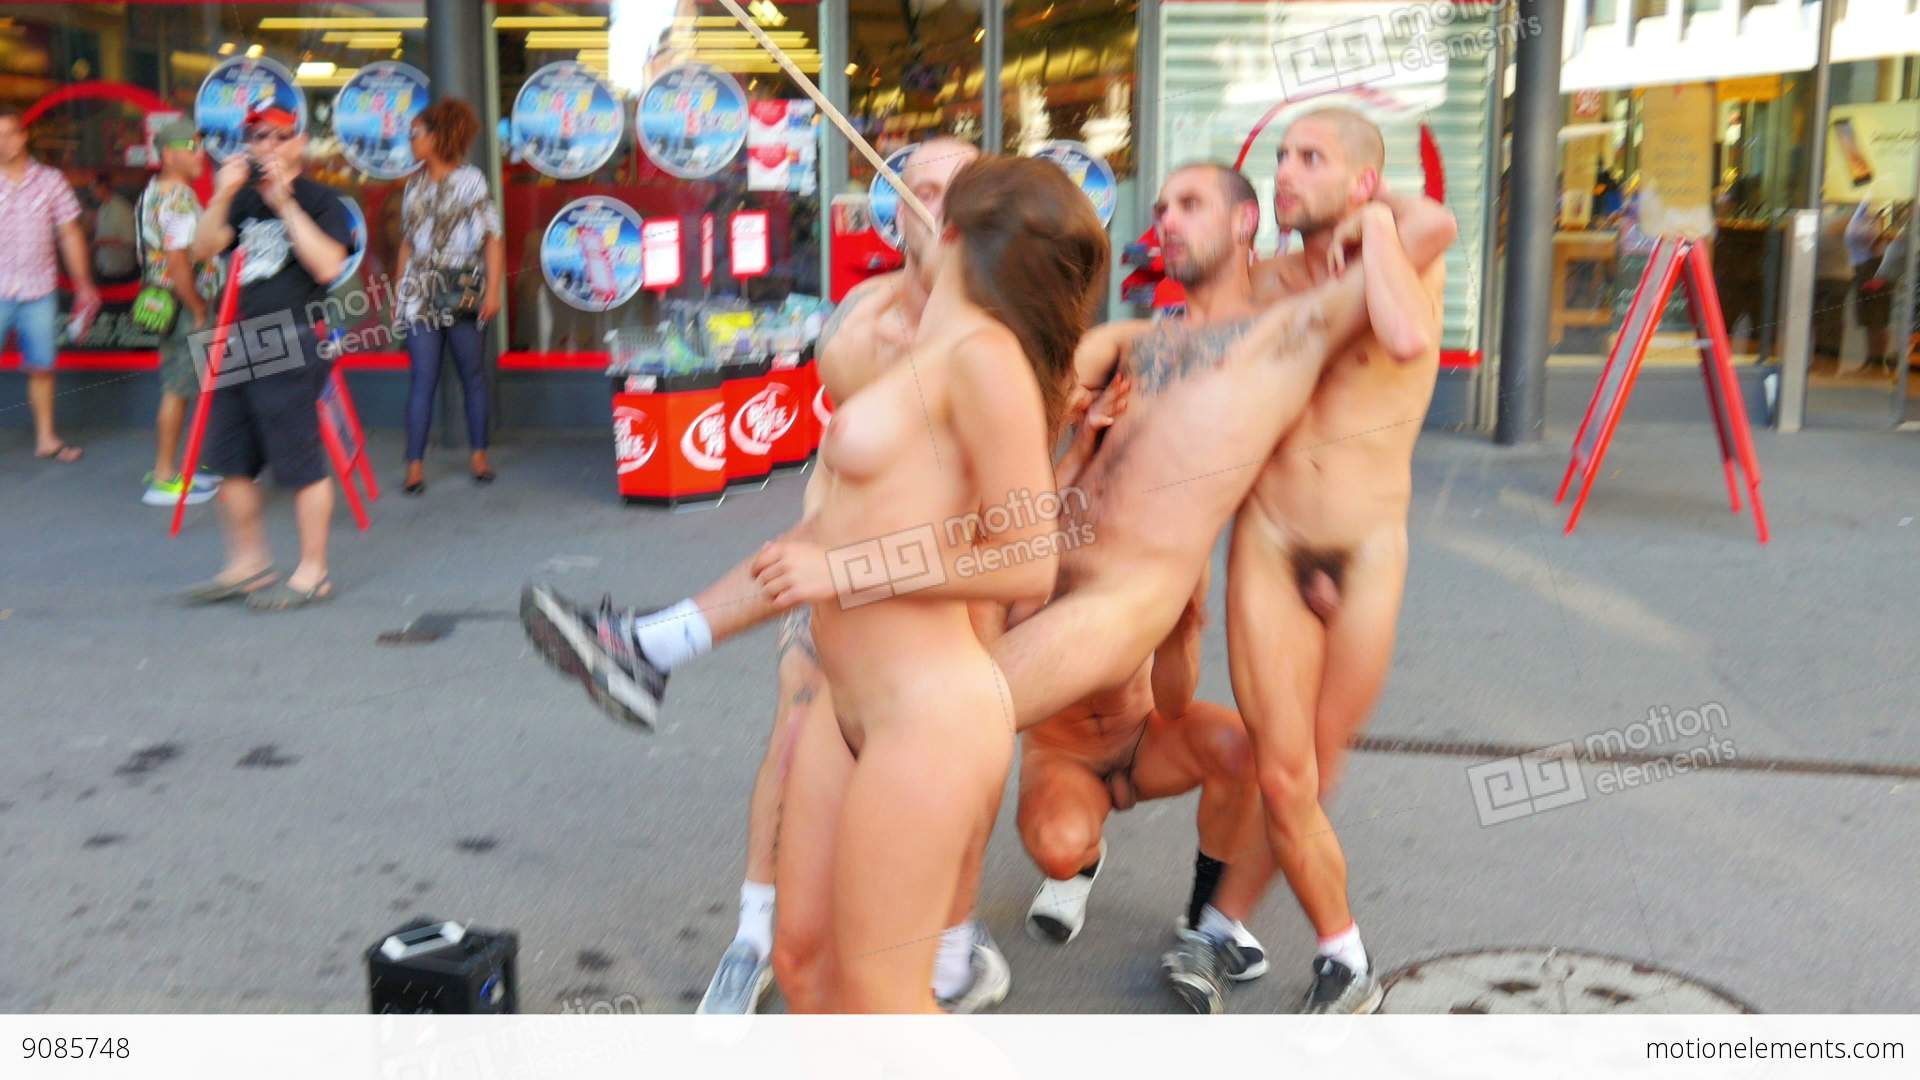 Enjoy seeing public nude Nice